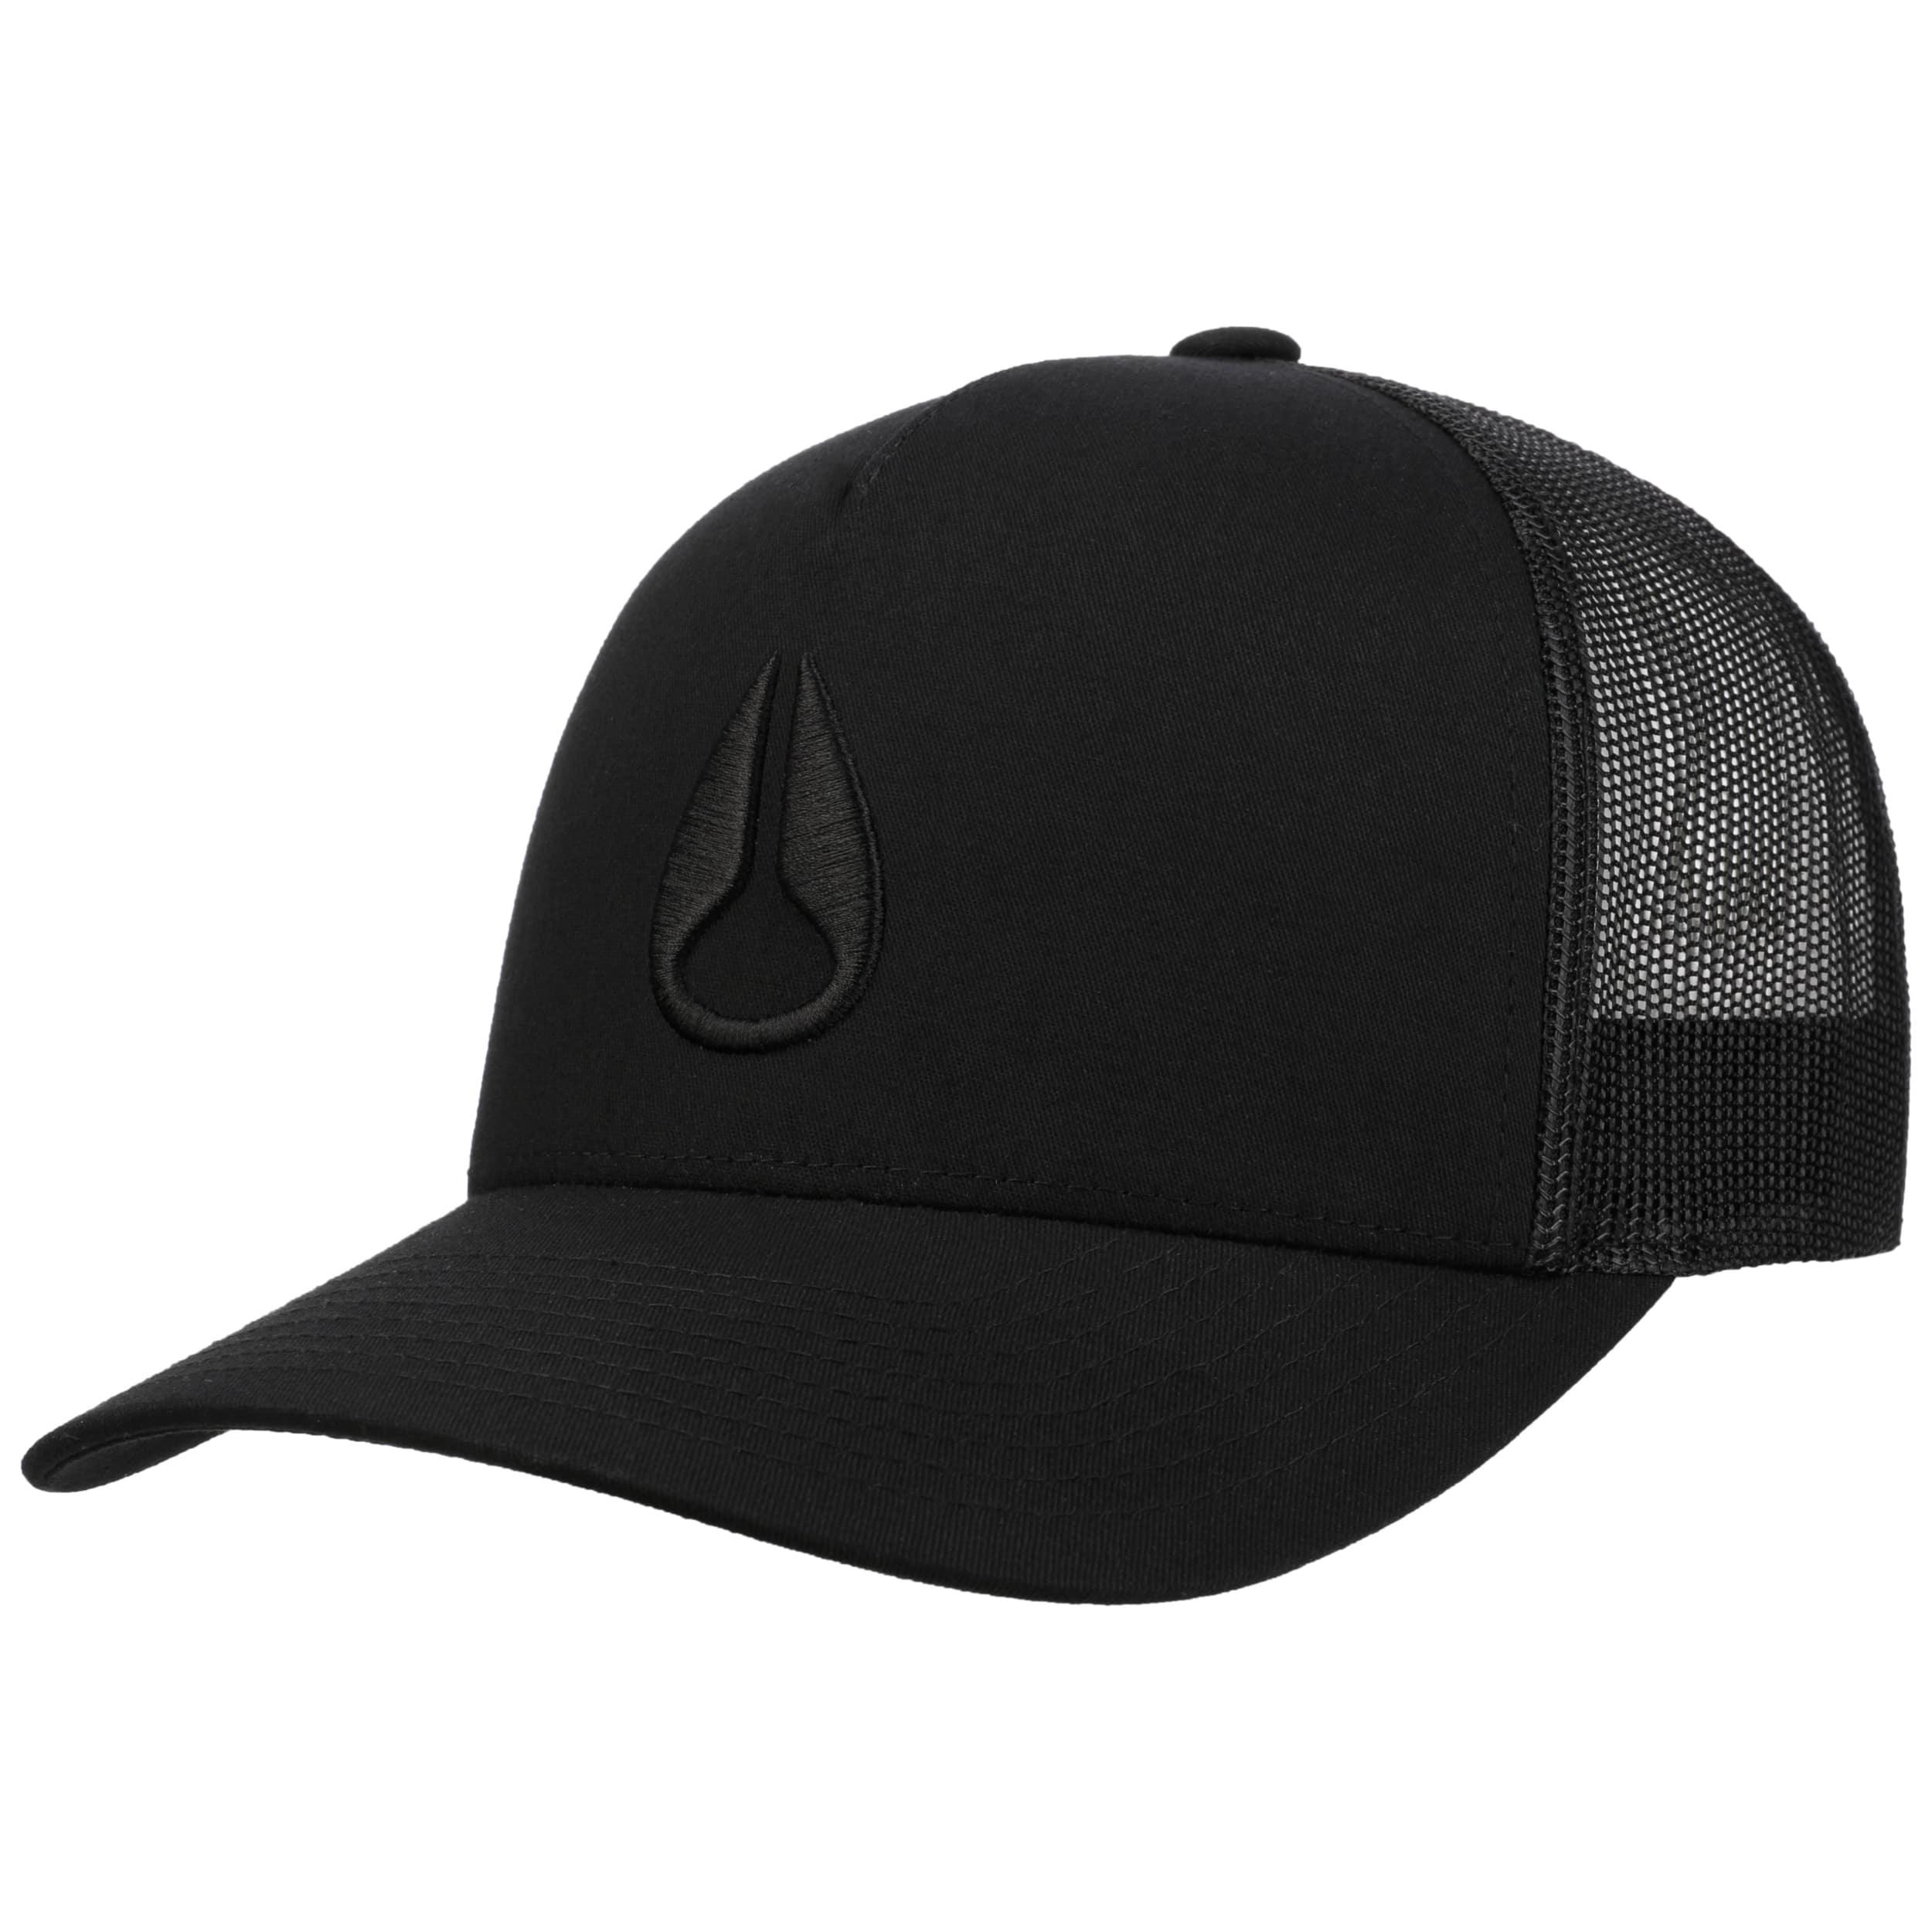 Iconed Trucker Cap. by Nixon 0afba883c28